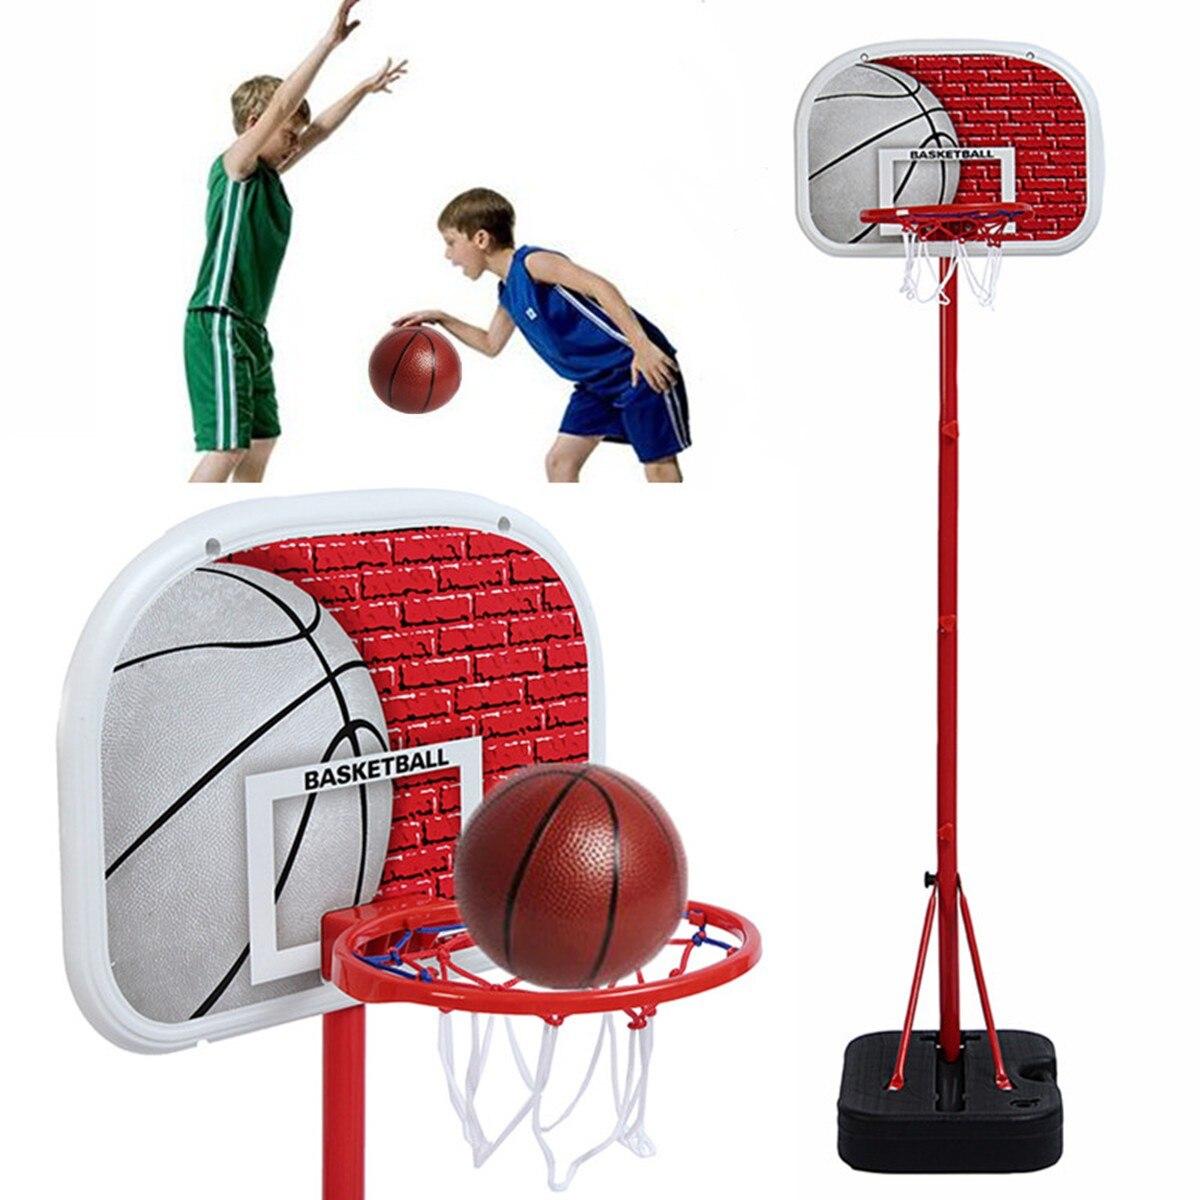 Kids Children Toy Adjustable Basketball Stand Backboard Nets Ball Pump Hoop System Goal Indoor Outdoor Sports Child Gift